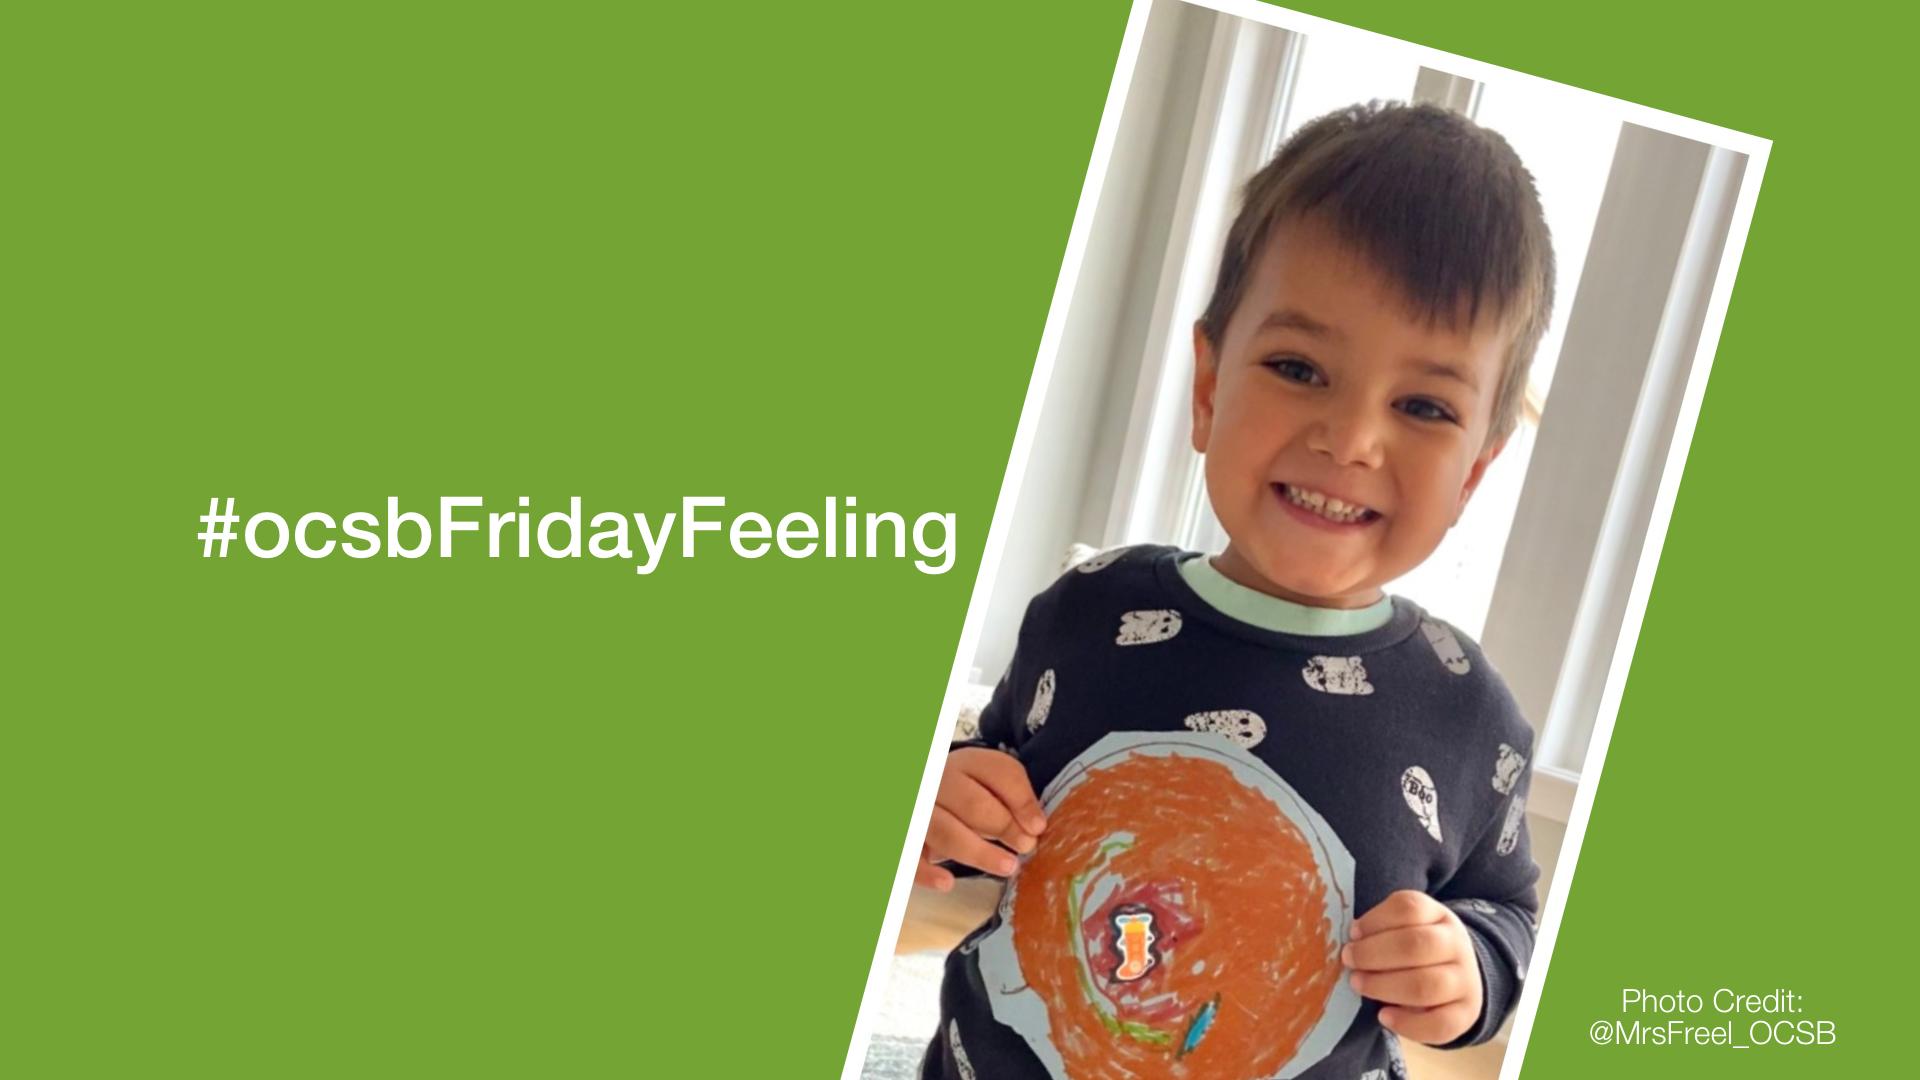 smiling boy holding artwork